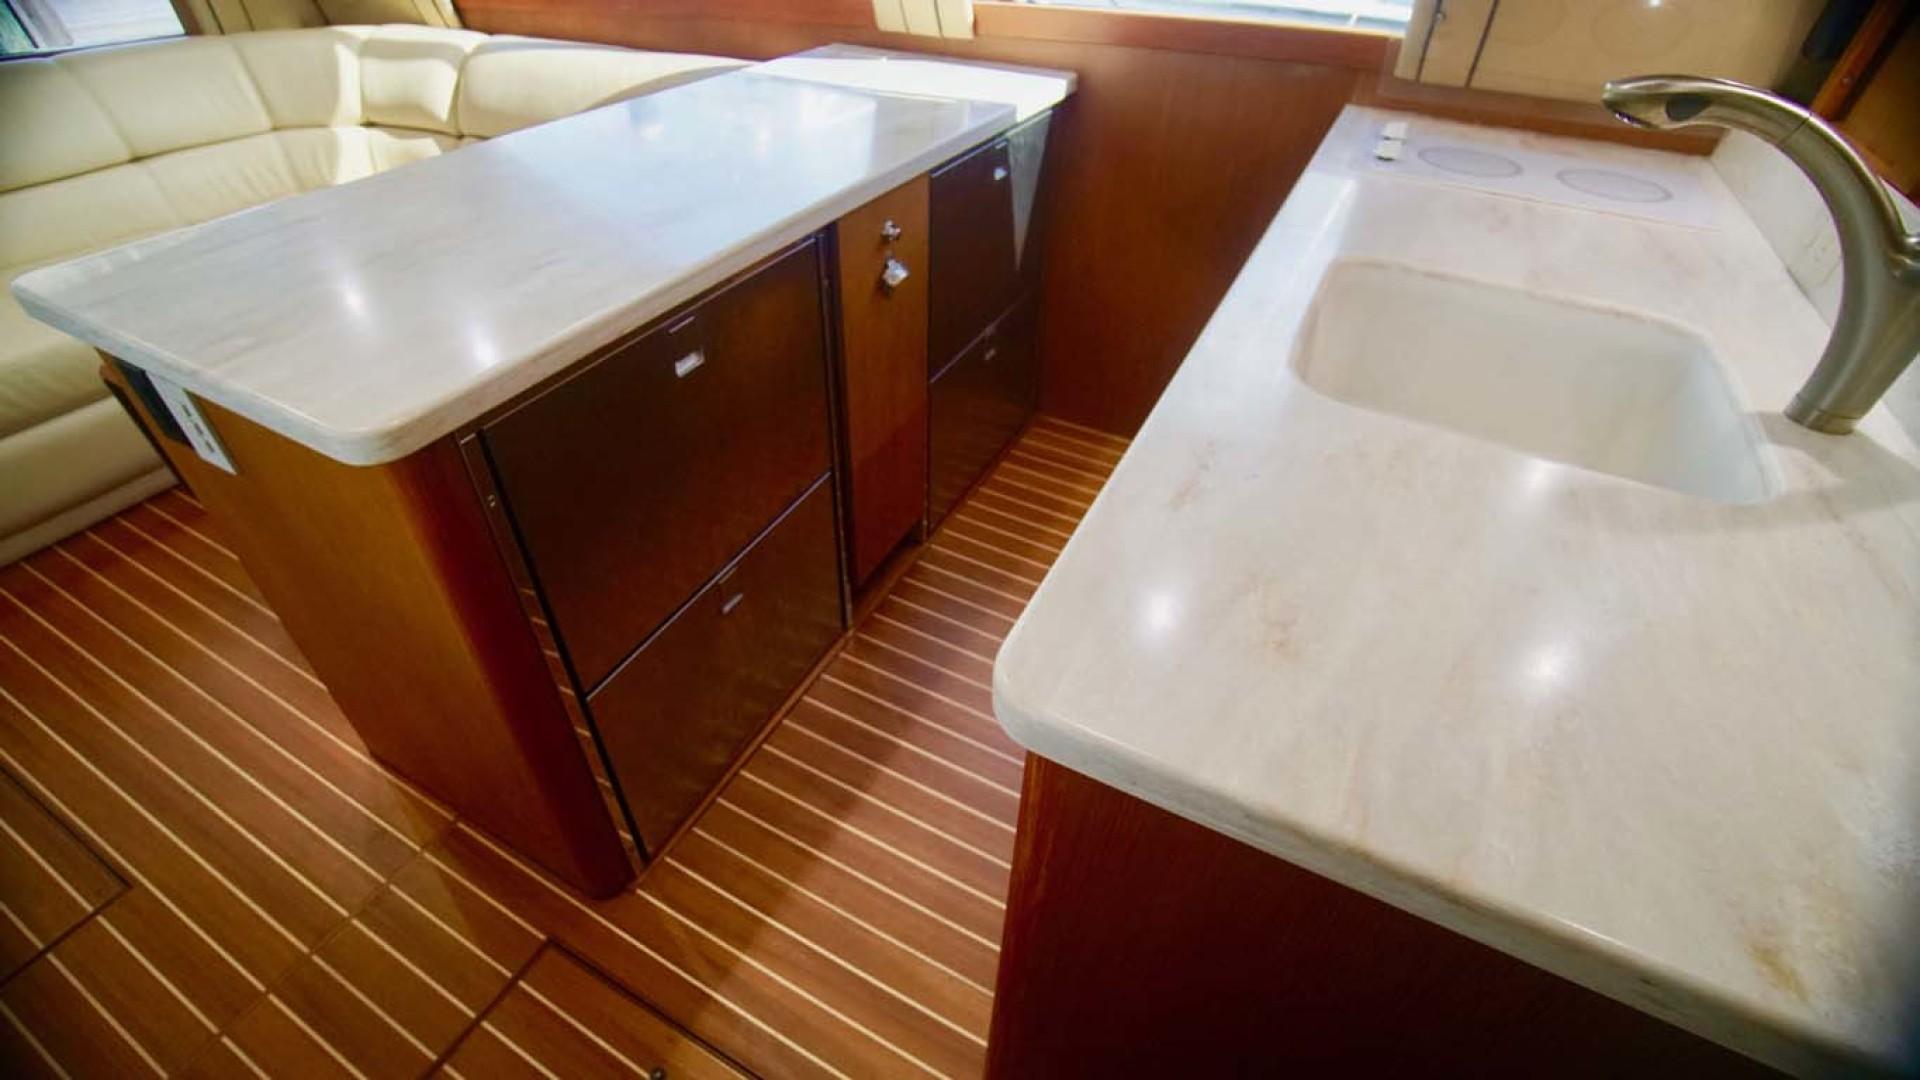 Ocean Yachts-43 Super Sport 2002-Desperado Orange Beach-Alabama-United States-Galley Refrigeration-1219854 | Thumbnail